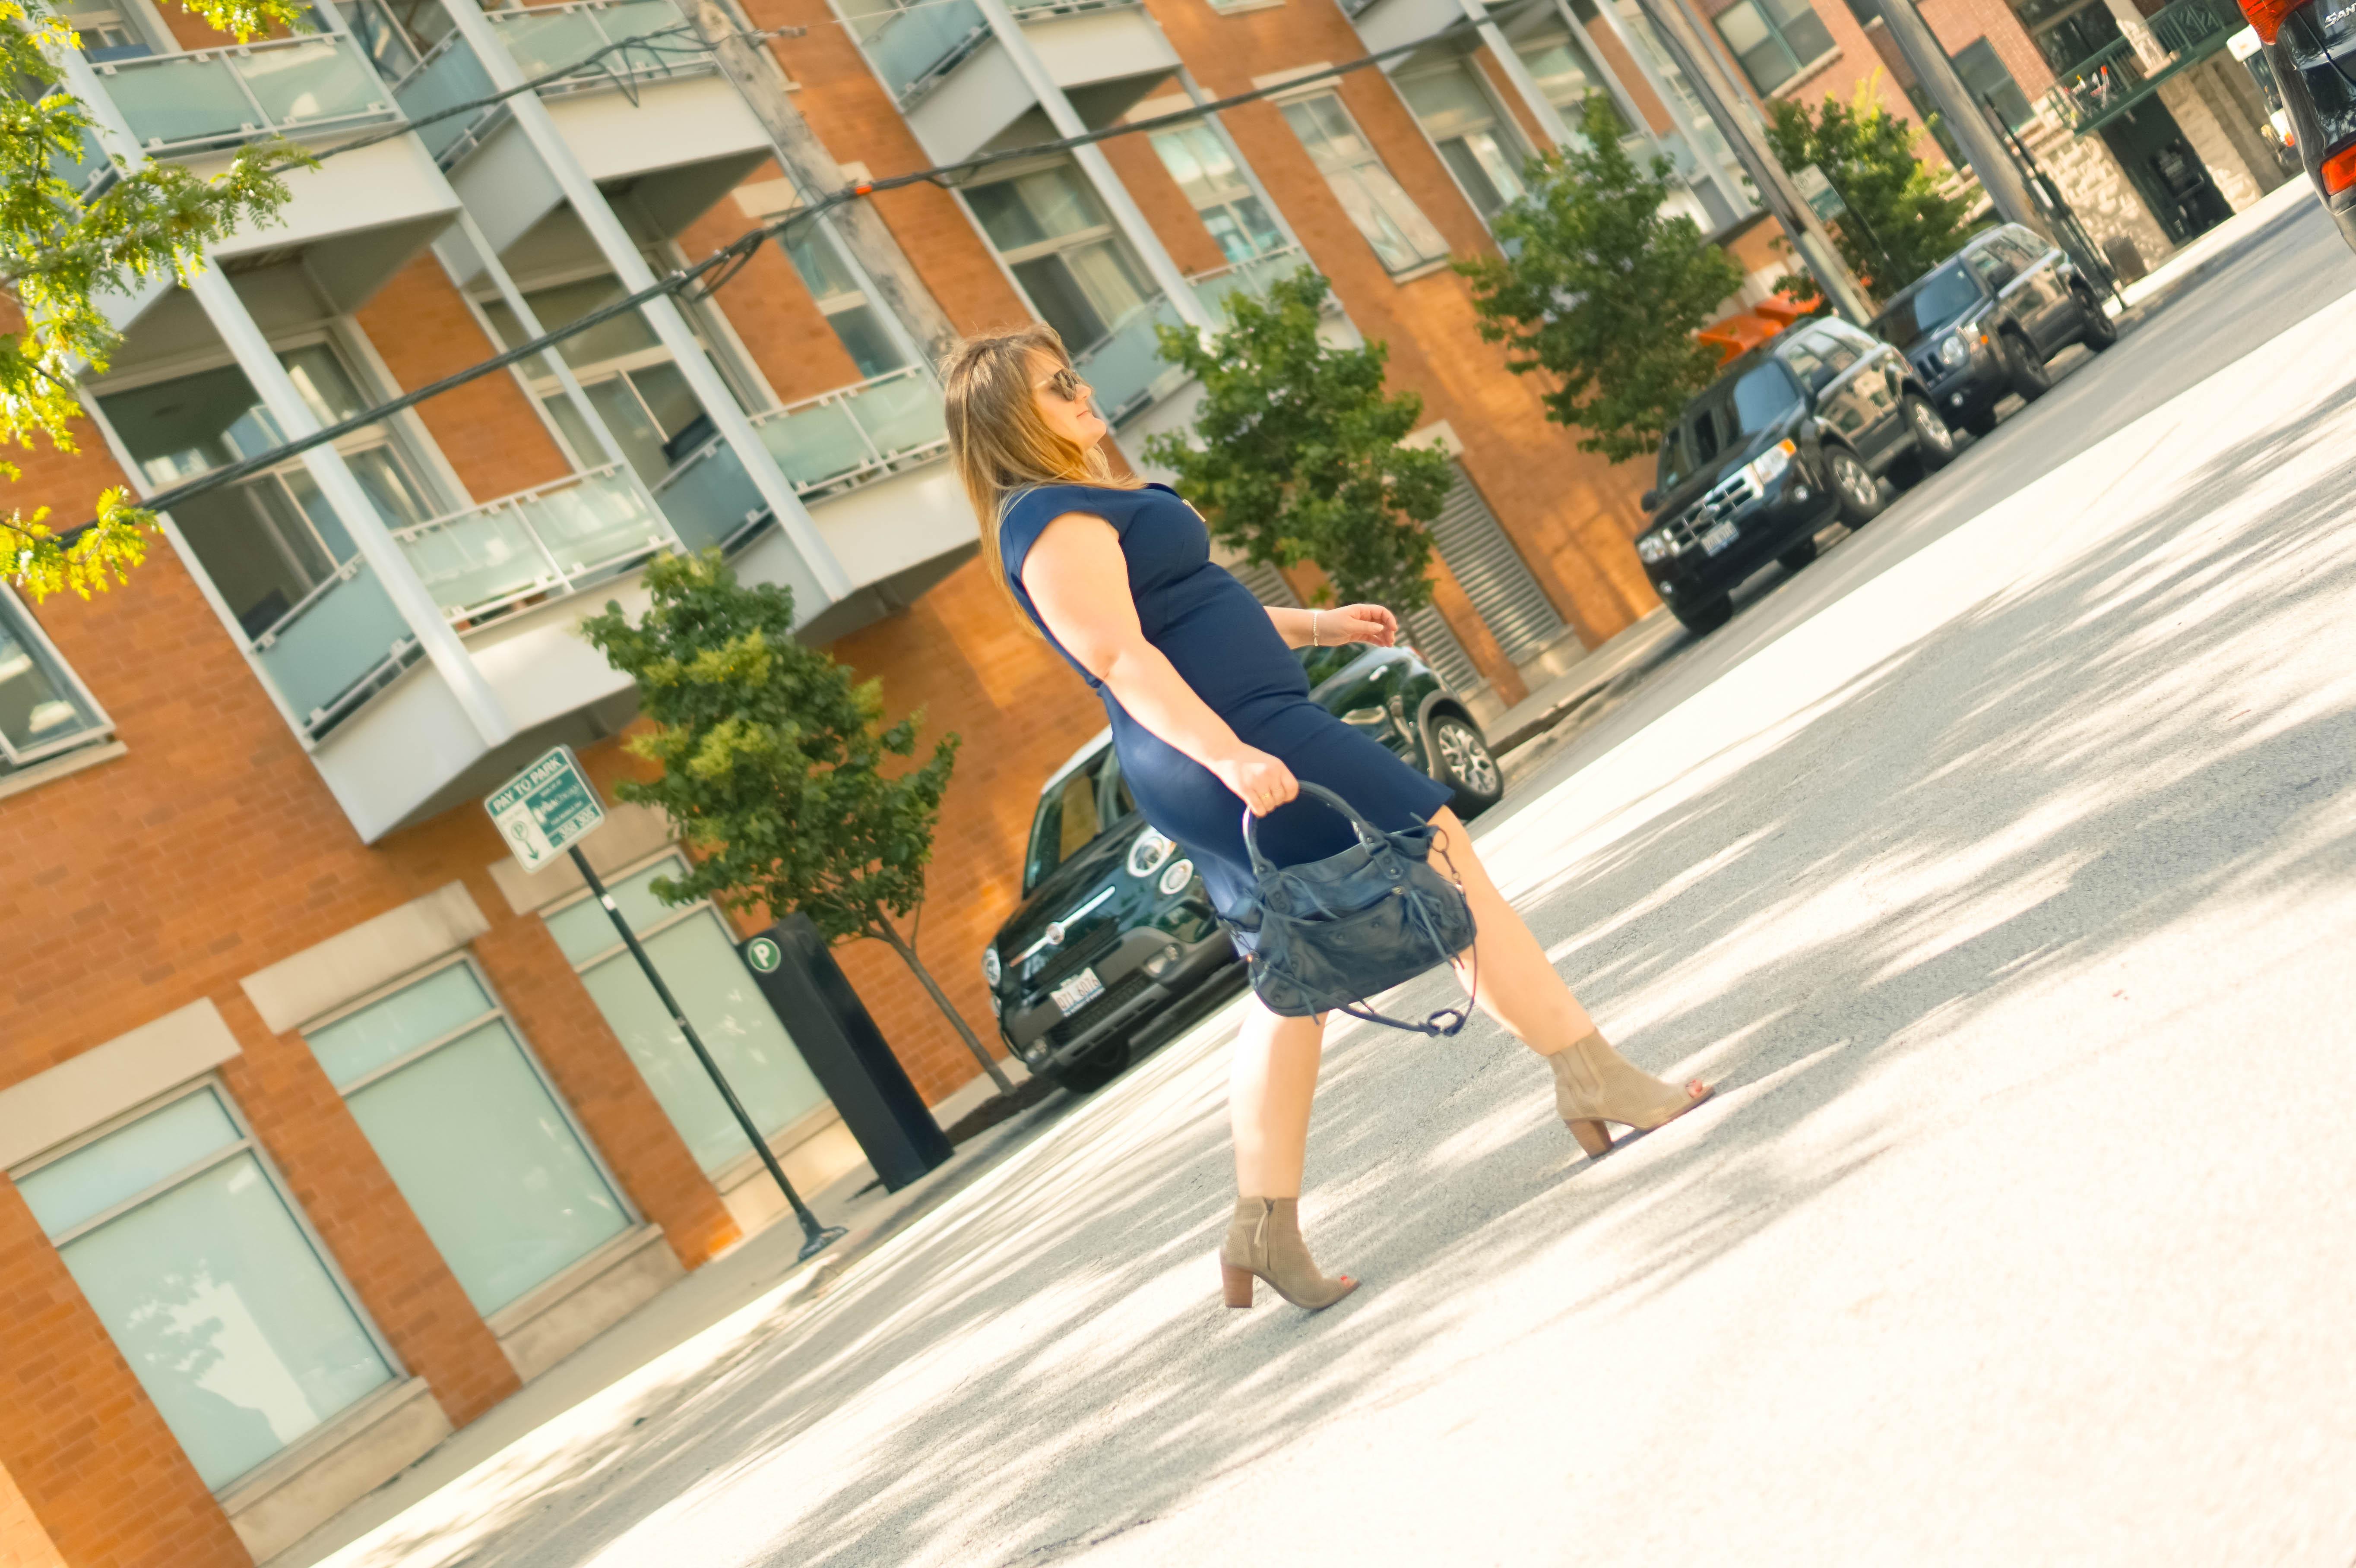 Ted Baker dress-crossing street